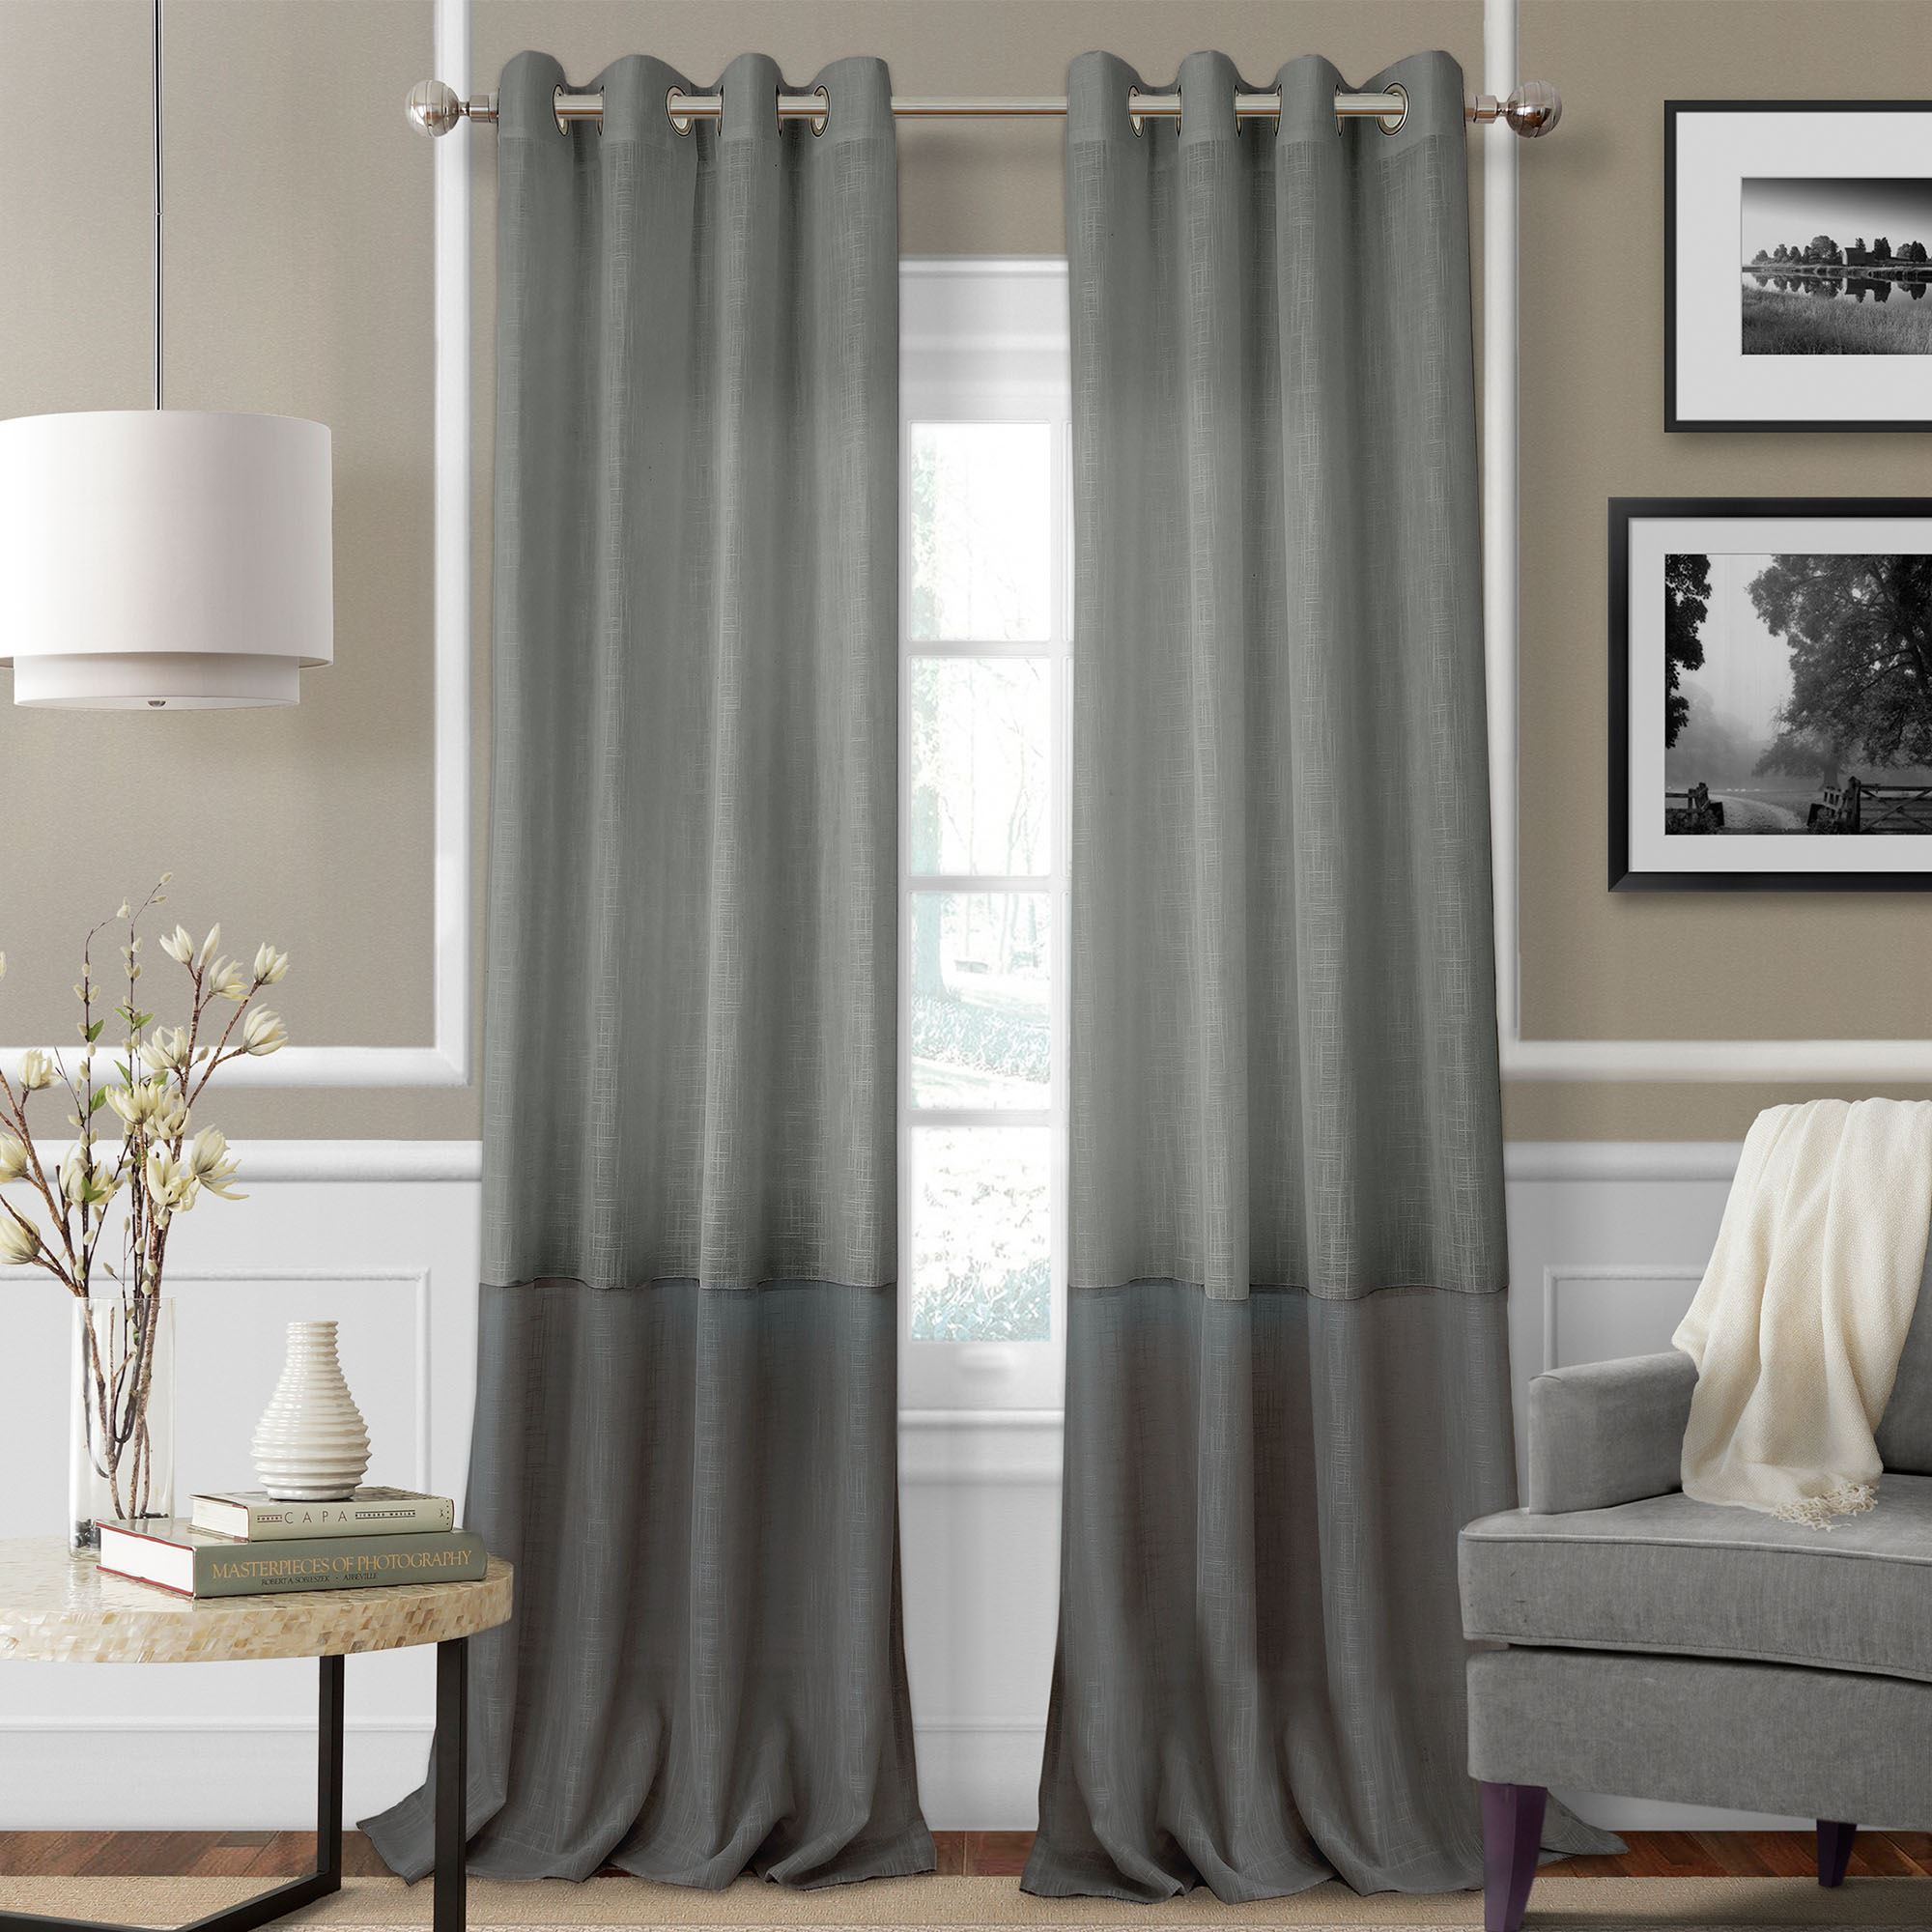 Melody Semi Sheer Grommet Curtain Panels